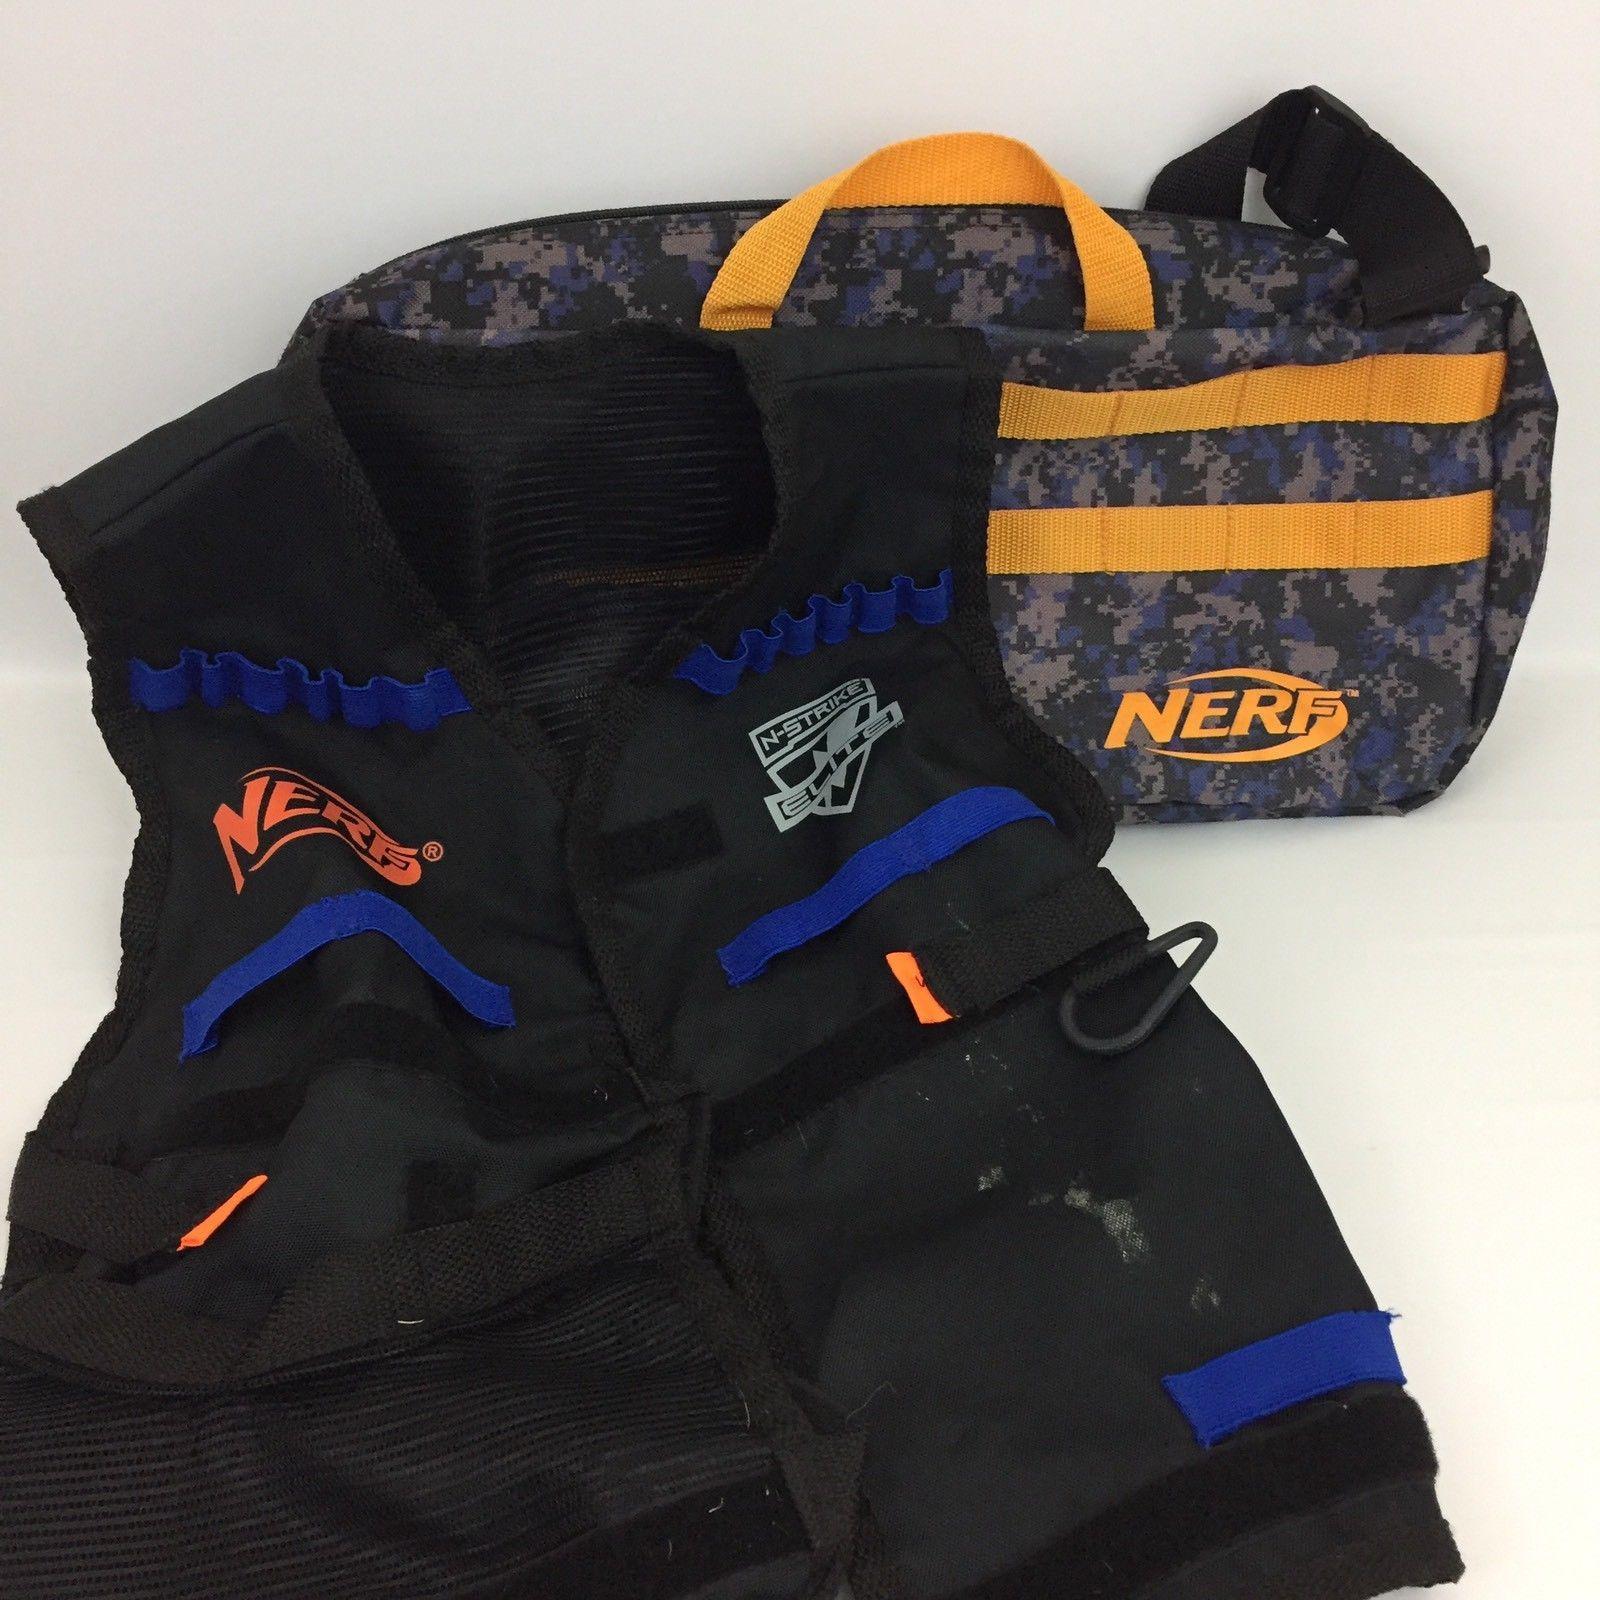 Nerf Gun Ammo Dart Duffle Bag and Tactical Vest N1